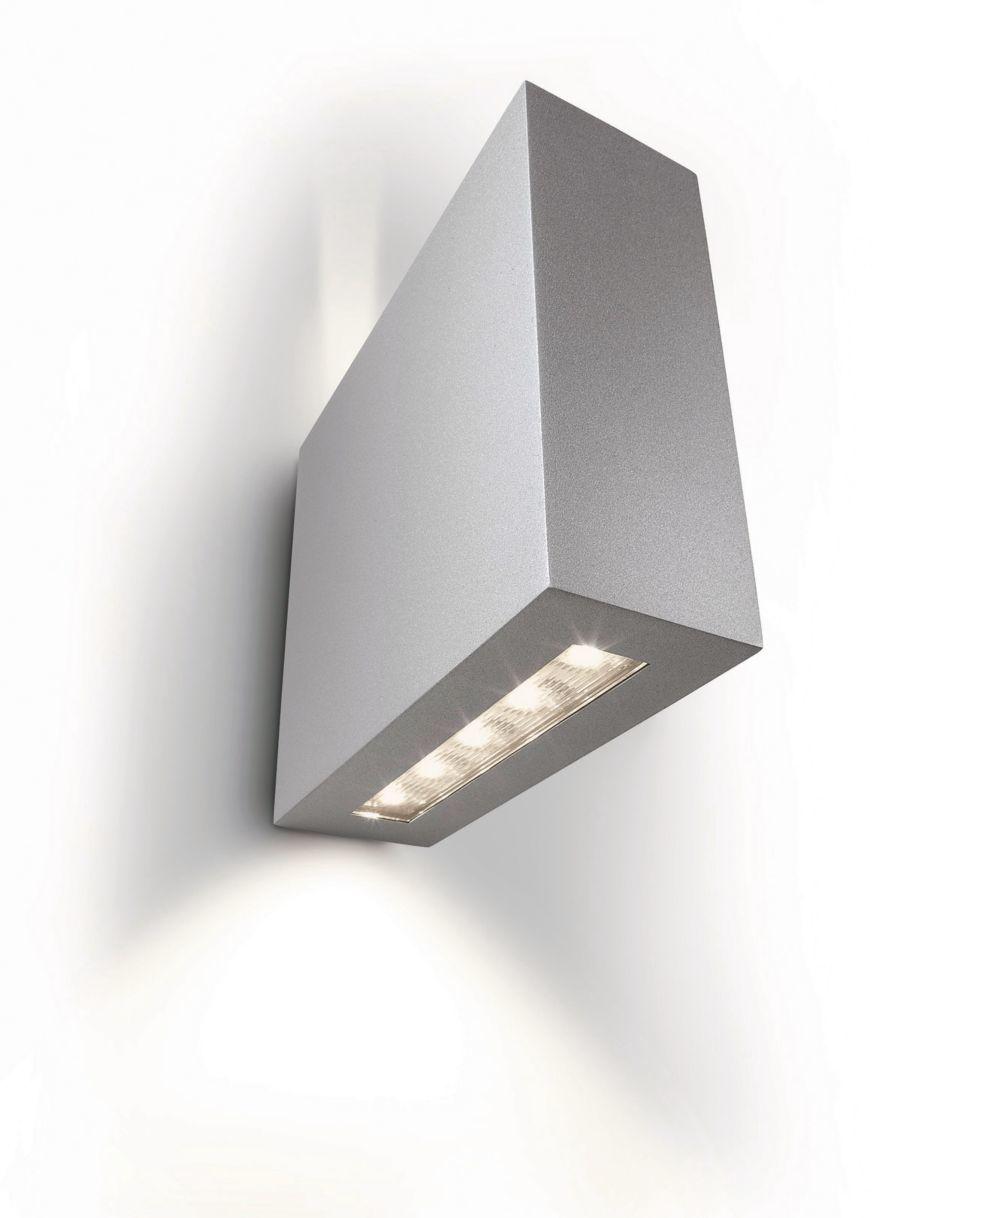 philips ledino led lampe au enbereich treeline wandleuchte dimmbar hellgrau ebay. Black Bedroom Furniture Sets. Home Design Ideas